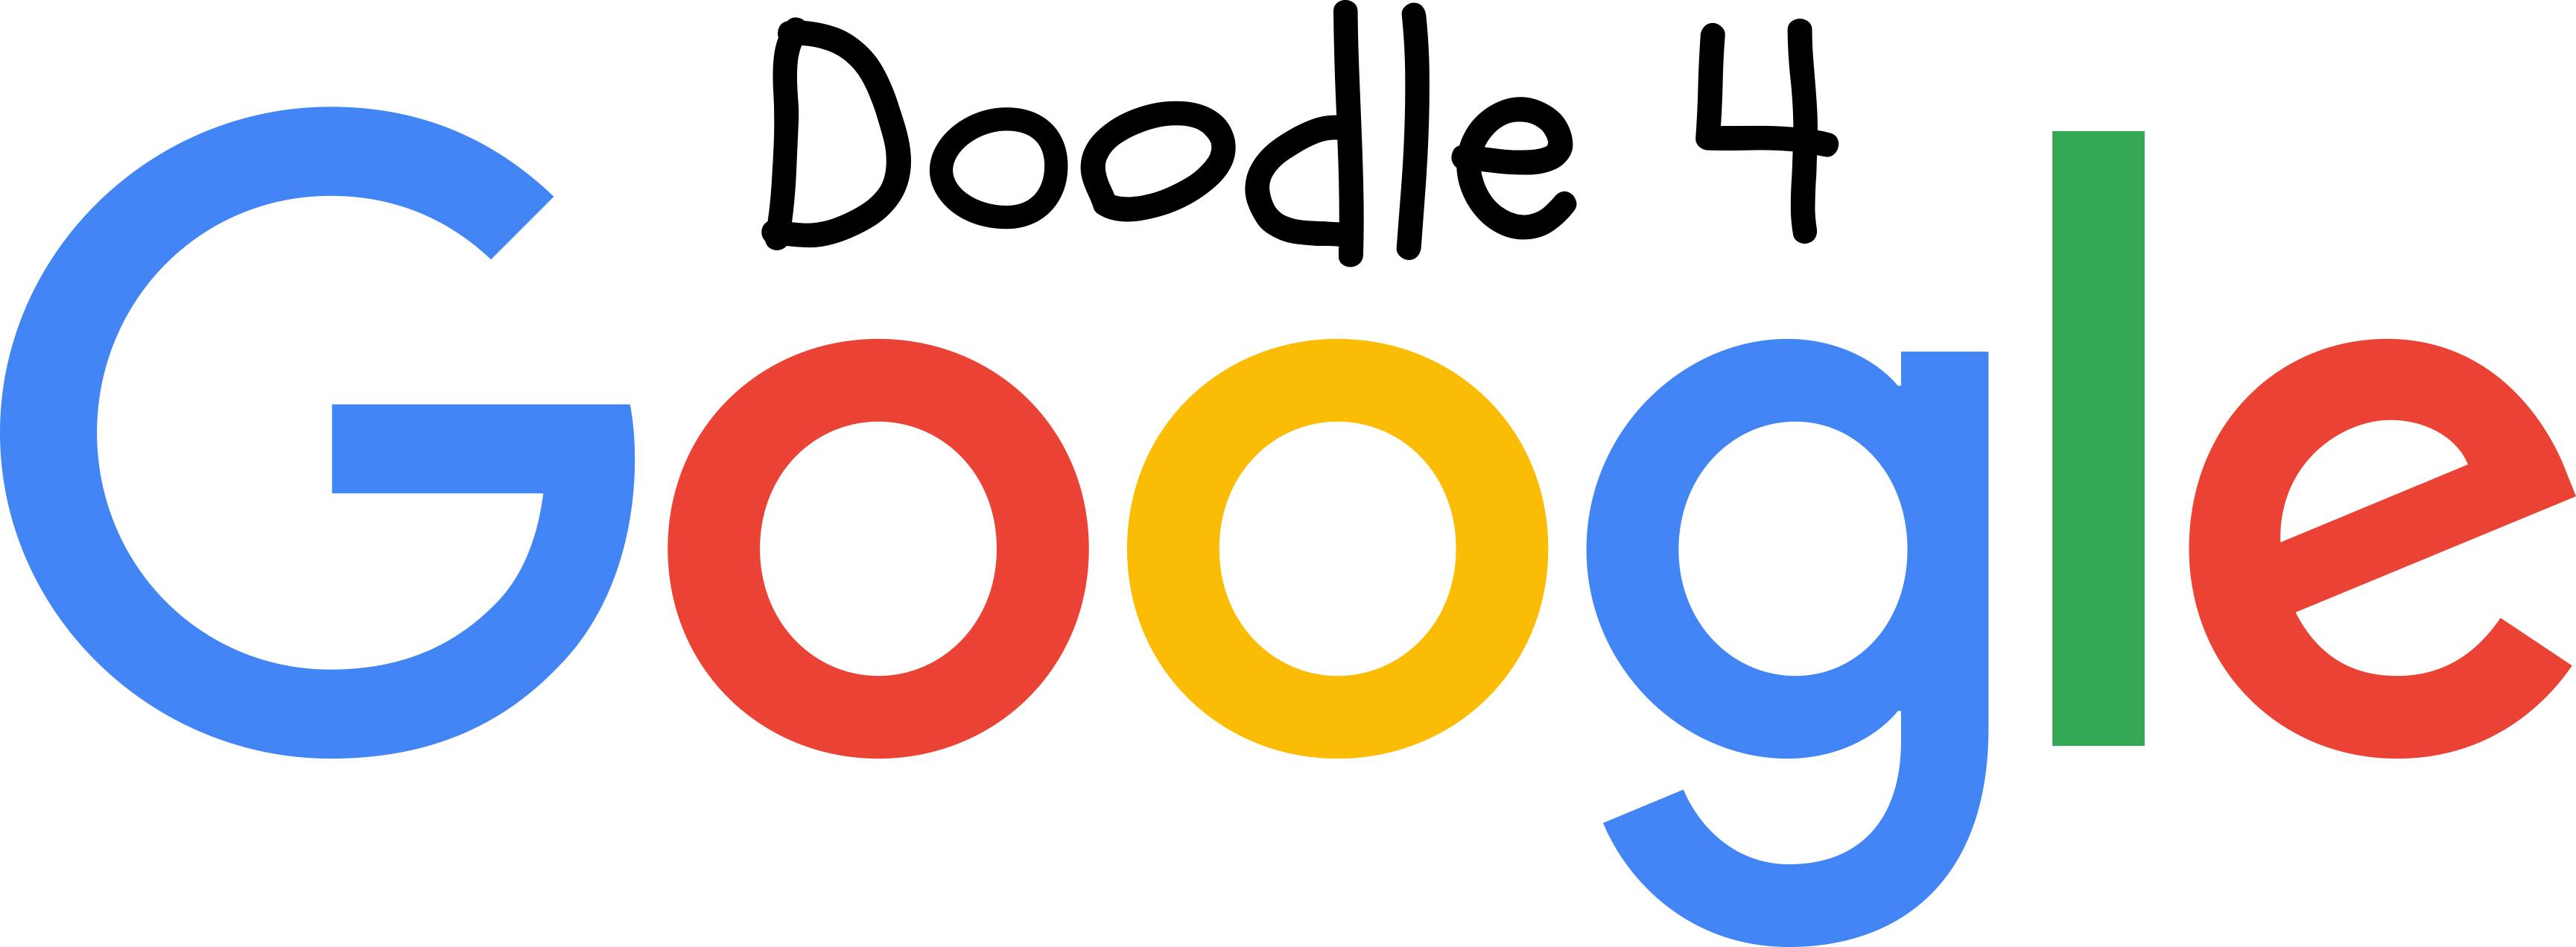 Clipart Google - Google Clip Art, Transparent background PNG HD thumbnail